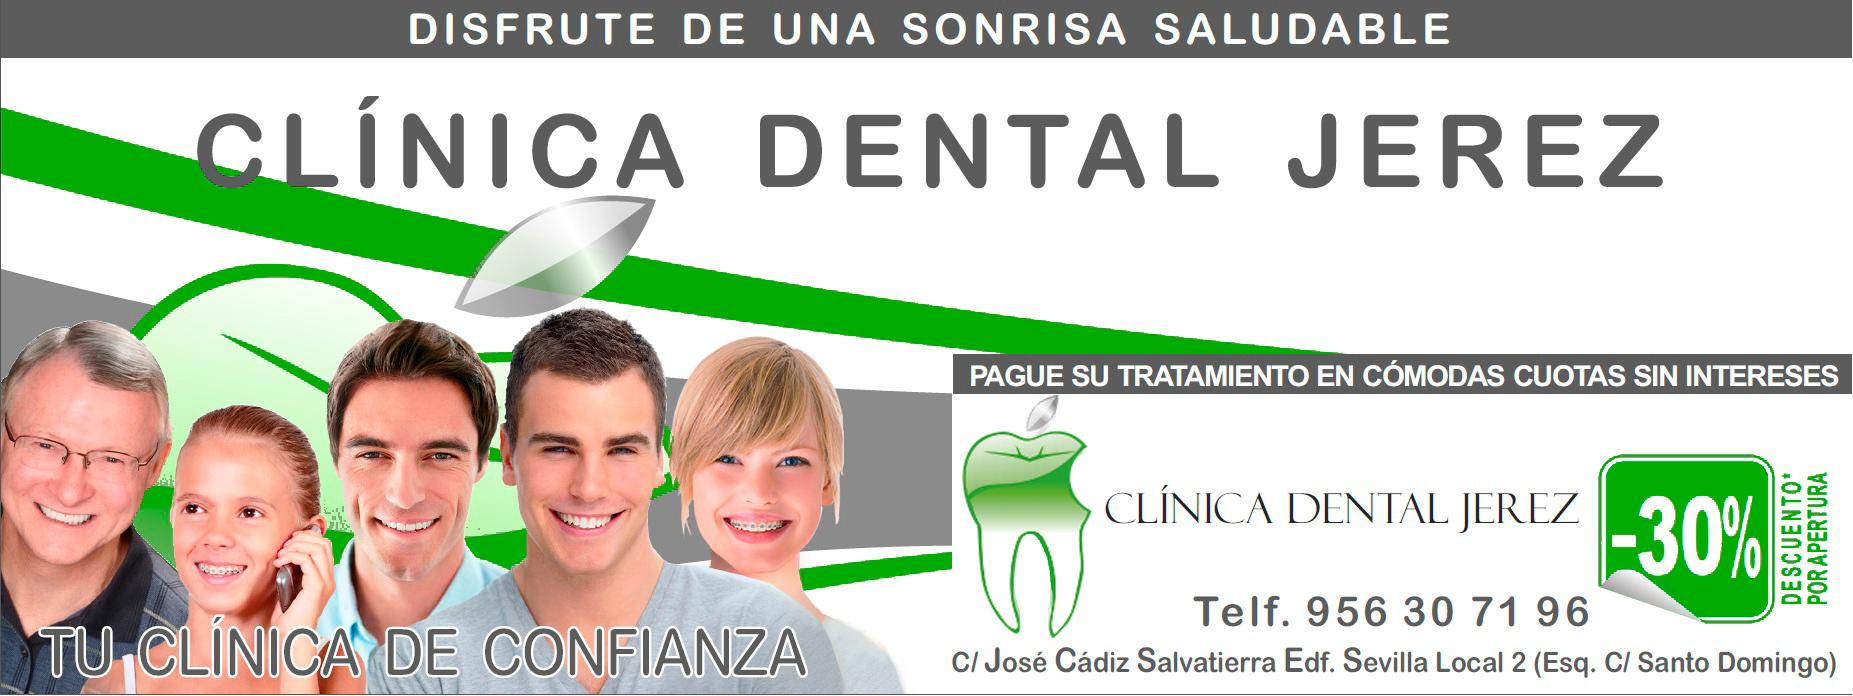 Promociones cl nica dental jerez for Clinica dental jerez de la frontera